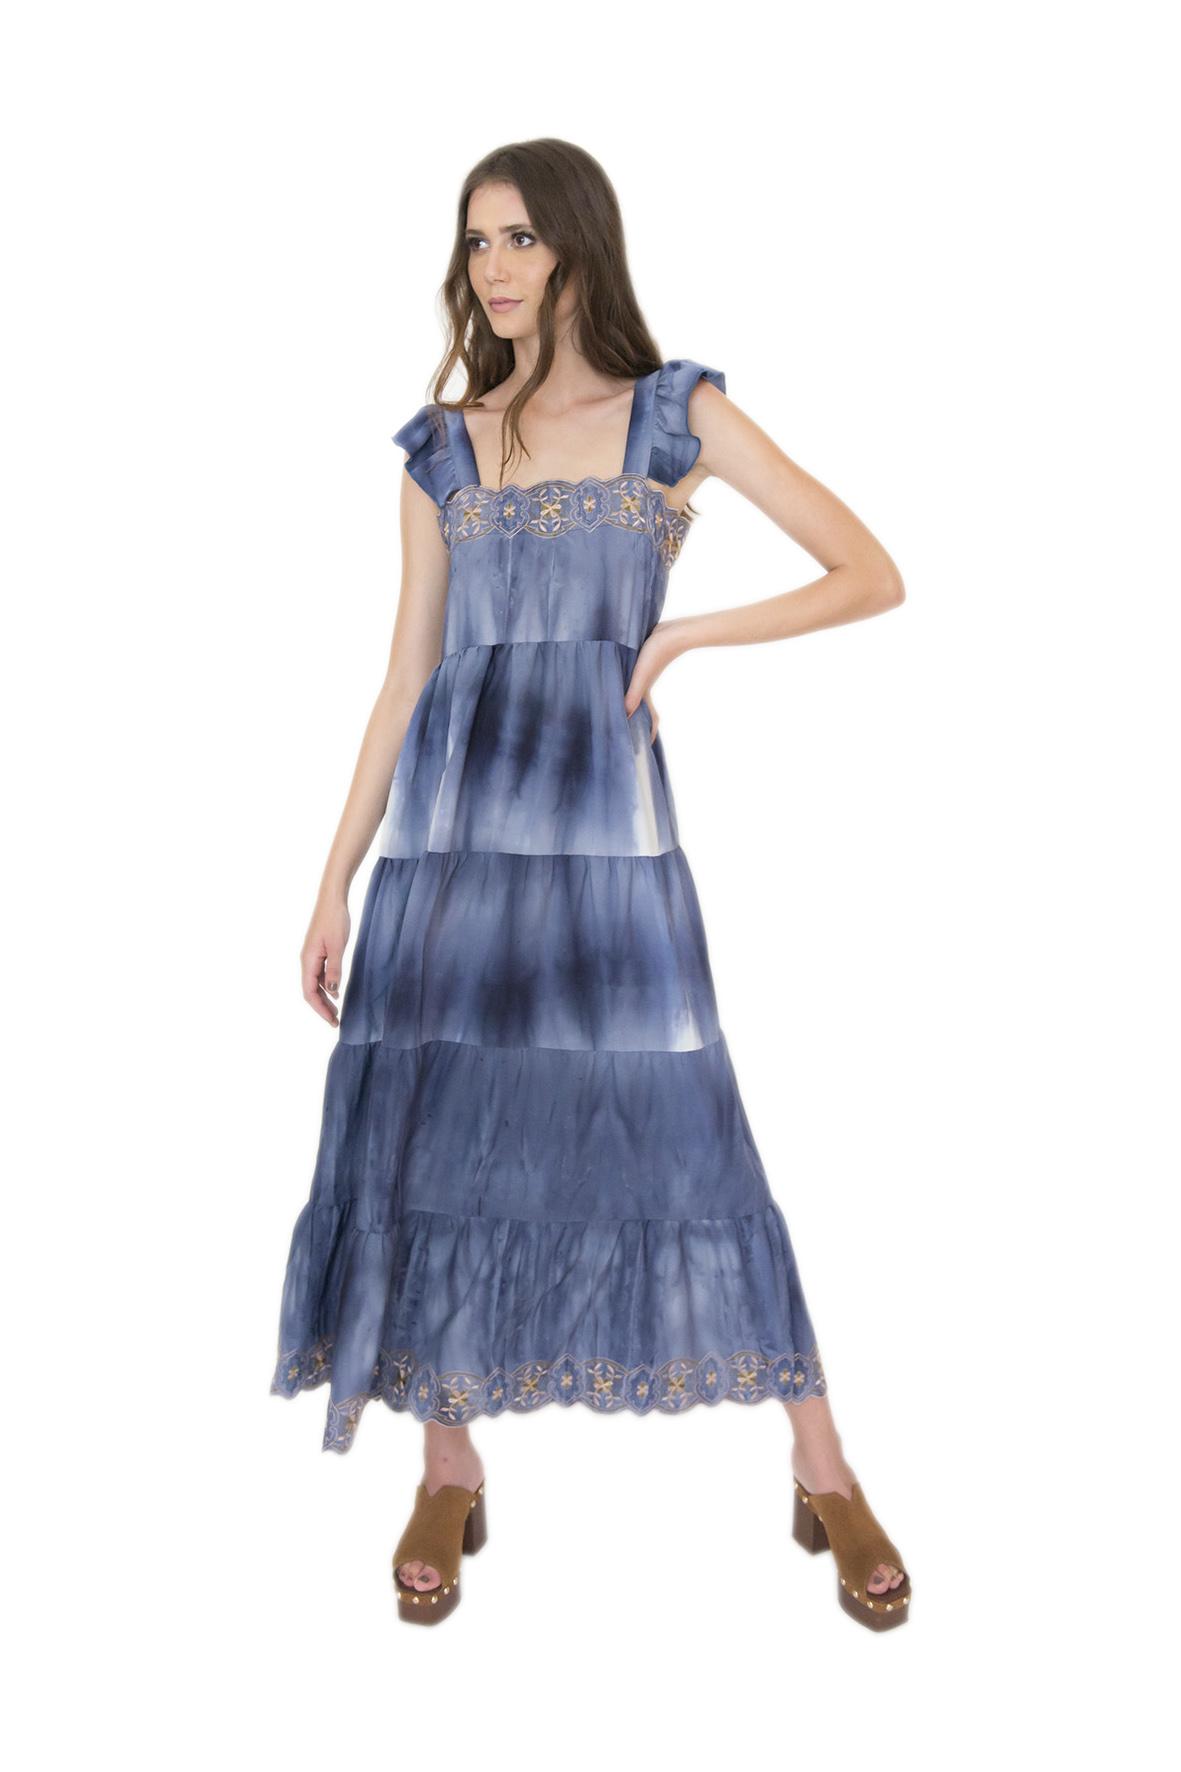 Tee Match - vestido bordado tie dye